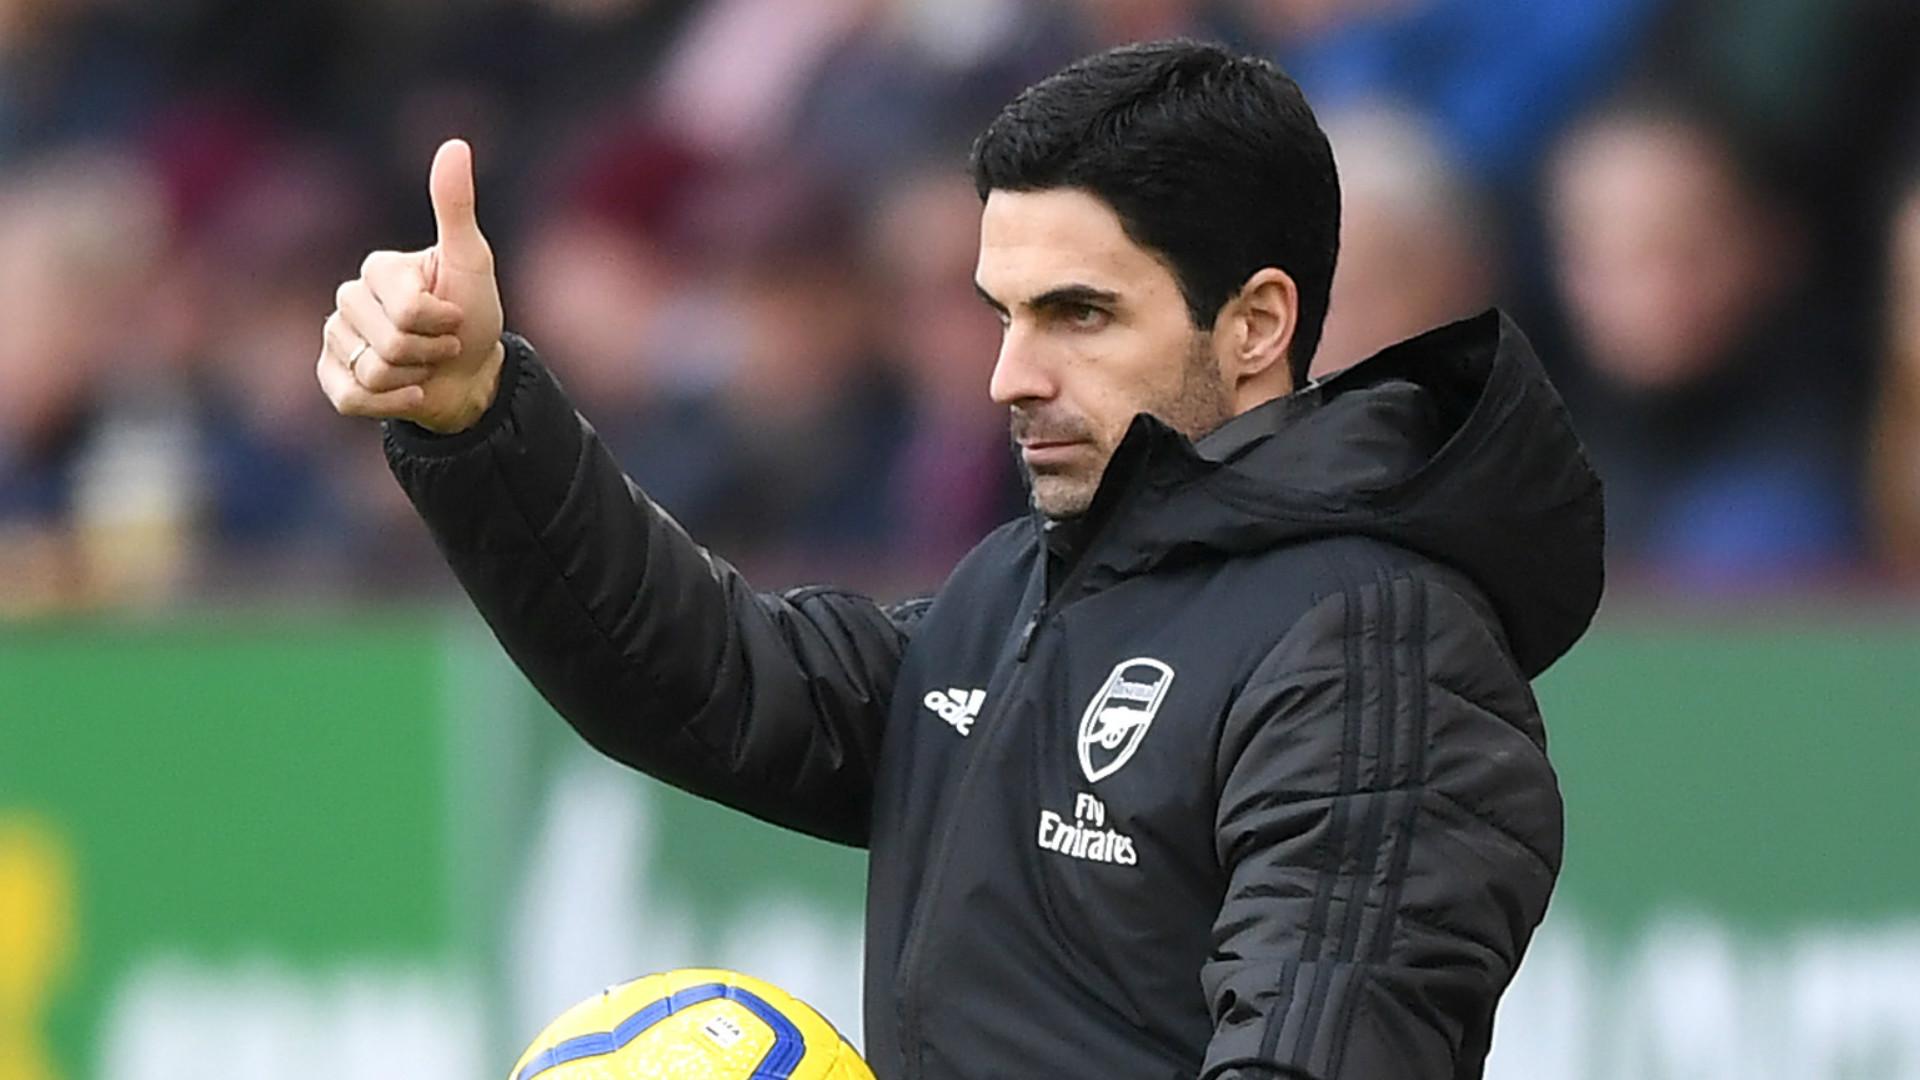 'Arteta's aura has benefitted everyone at Arsenal' – Mustafi hails 'incredible' Gunners boss